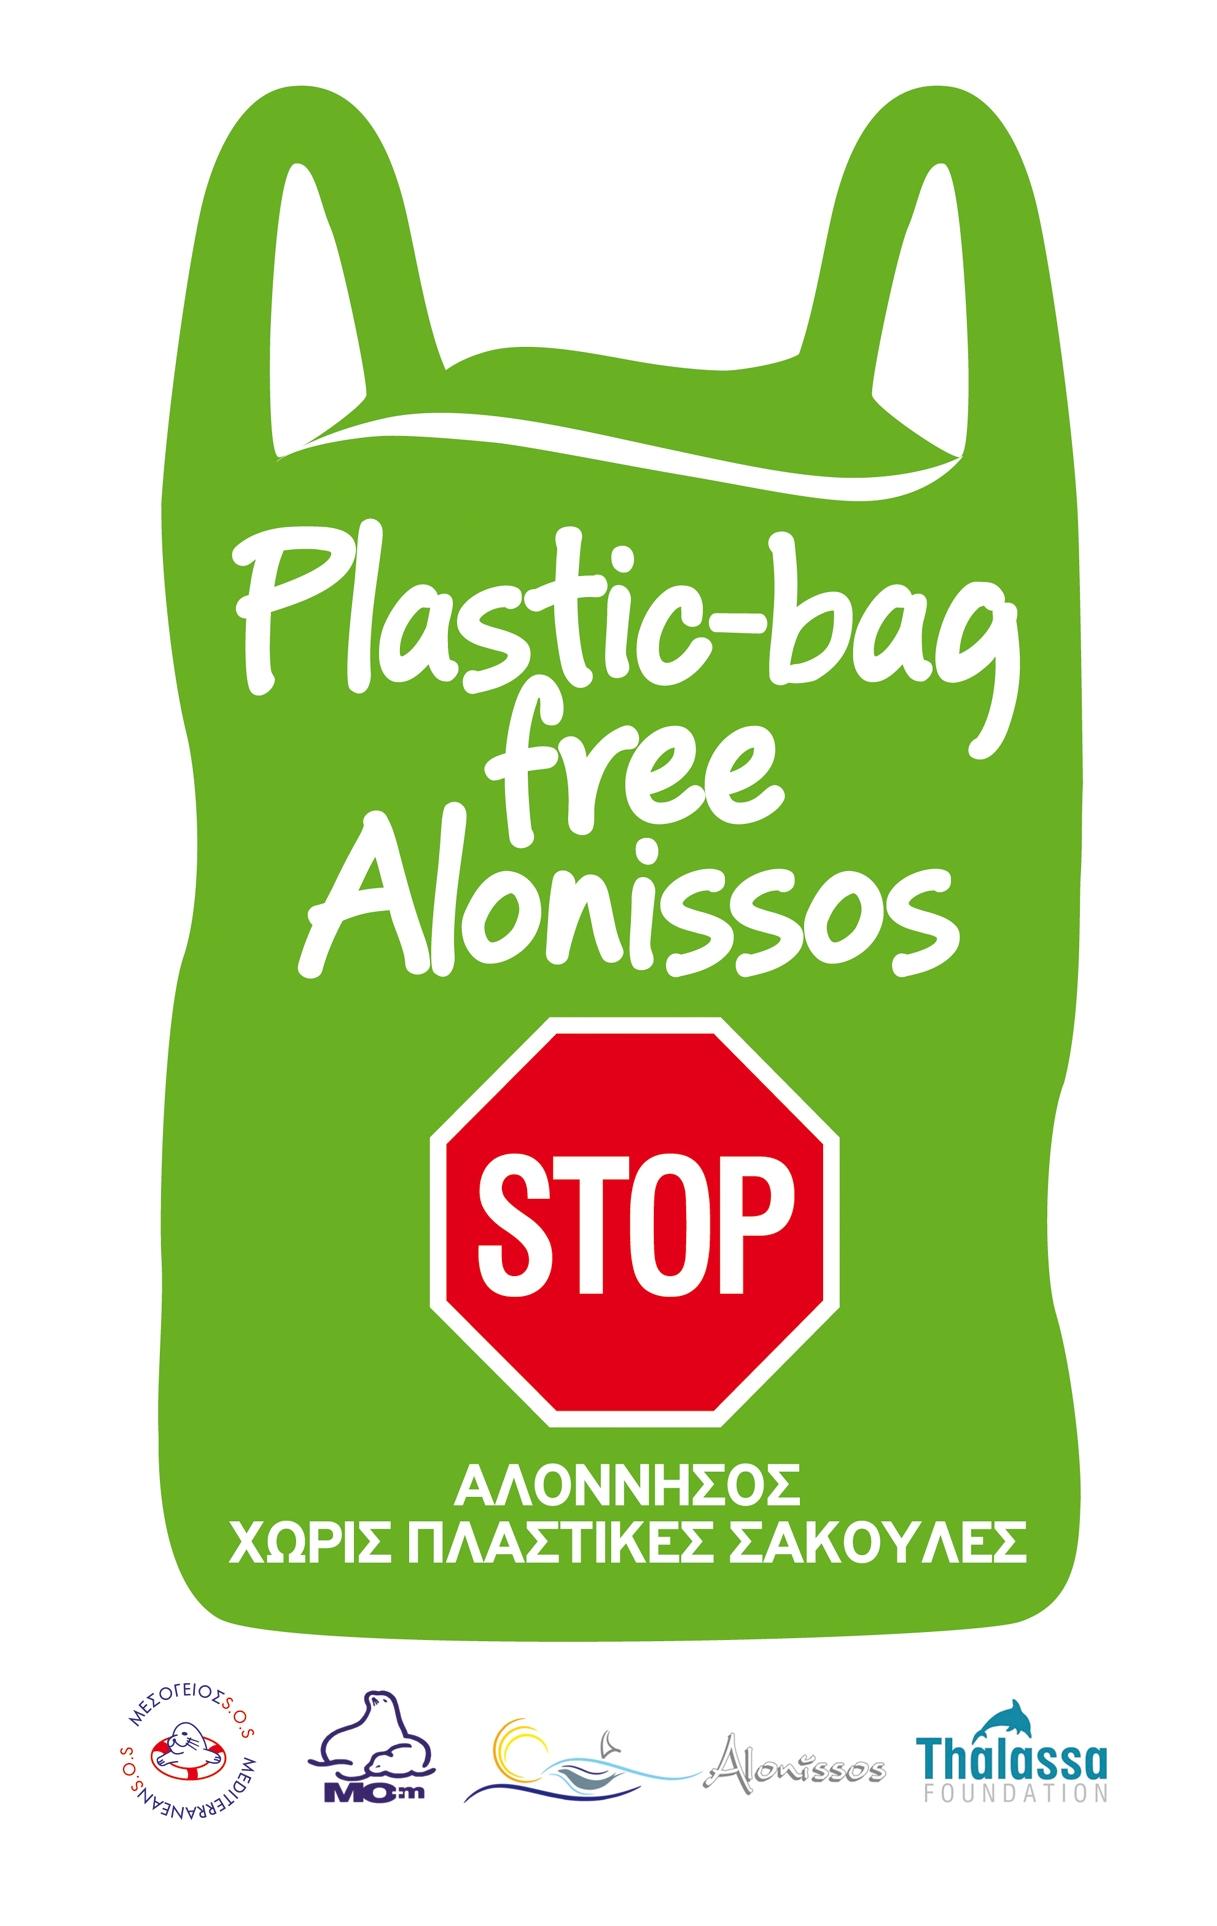 Plastic_Bag_Free_Alonissos_Logo_Final.indd